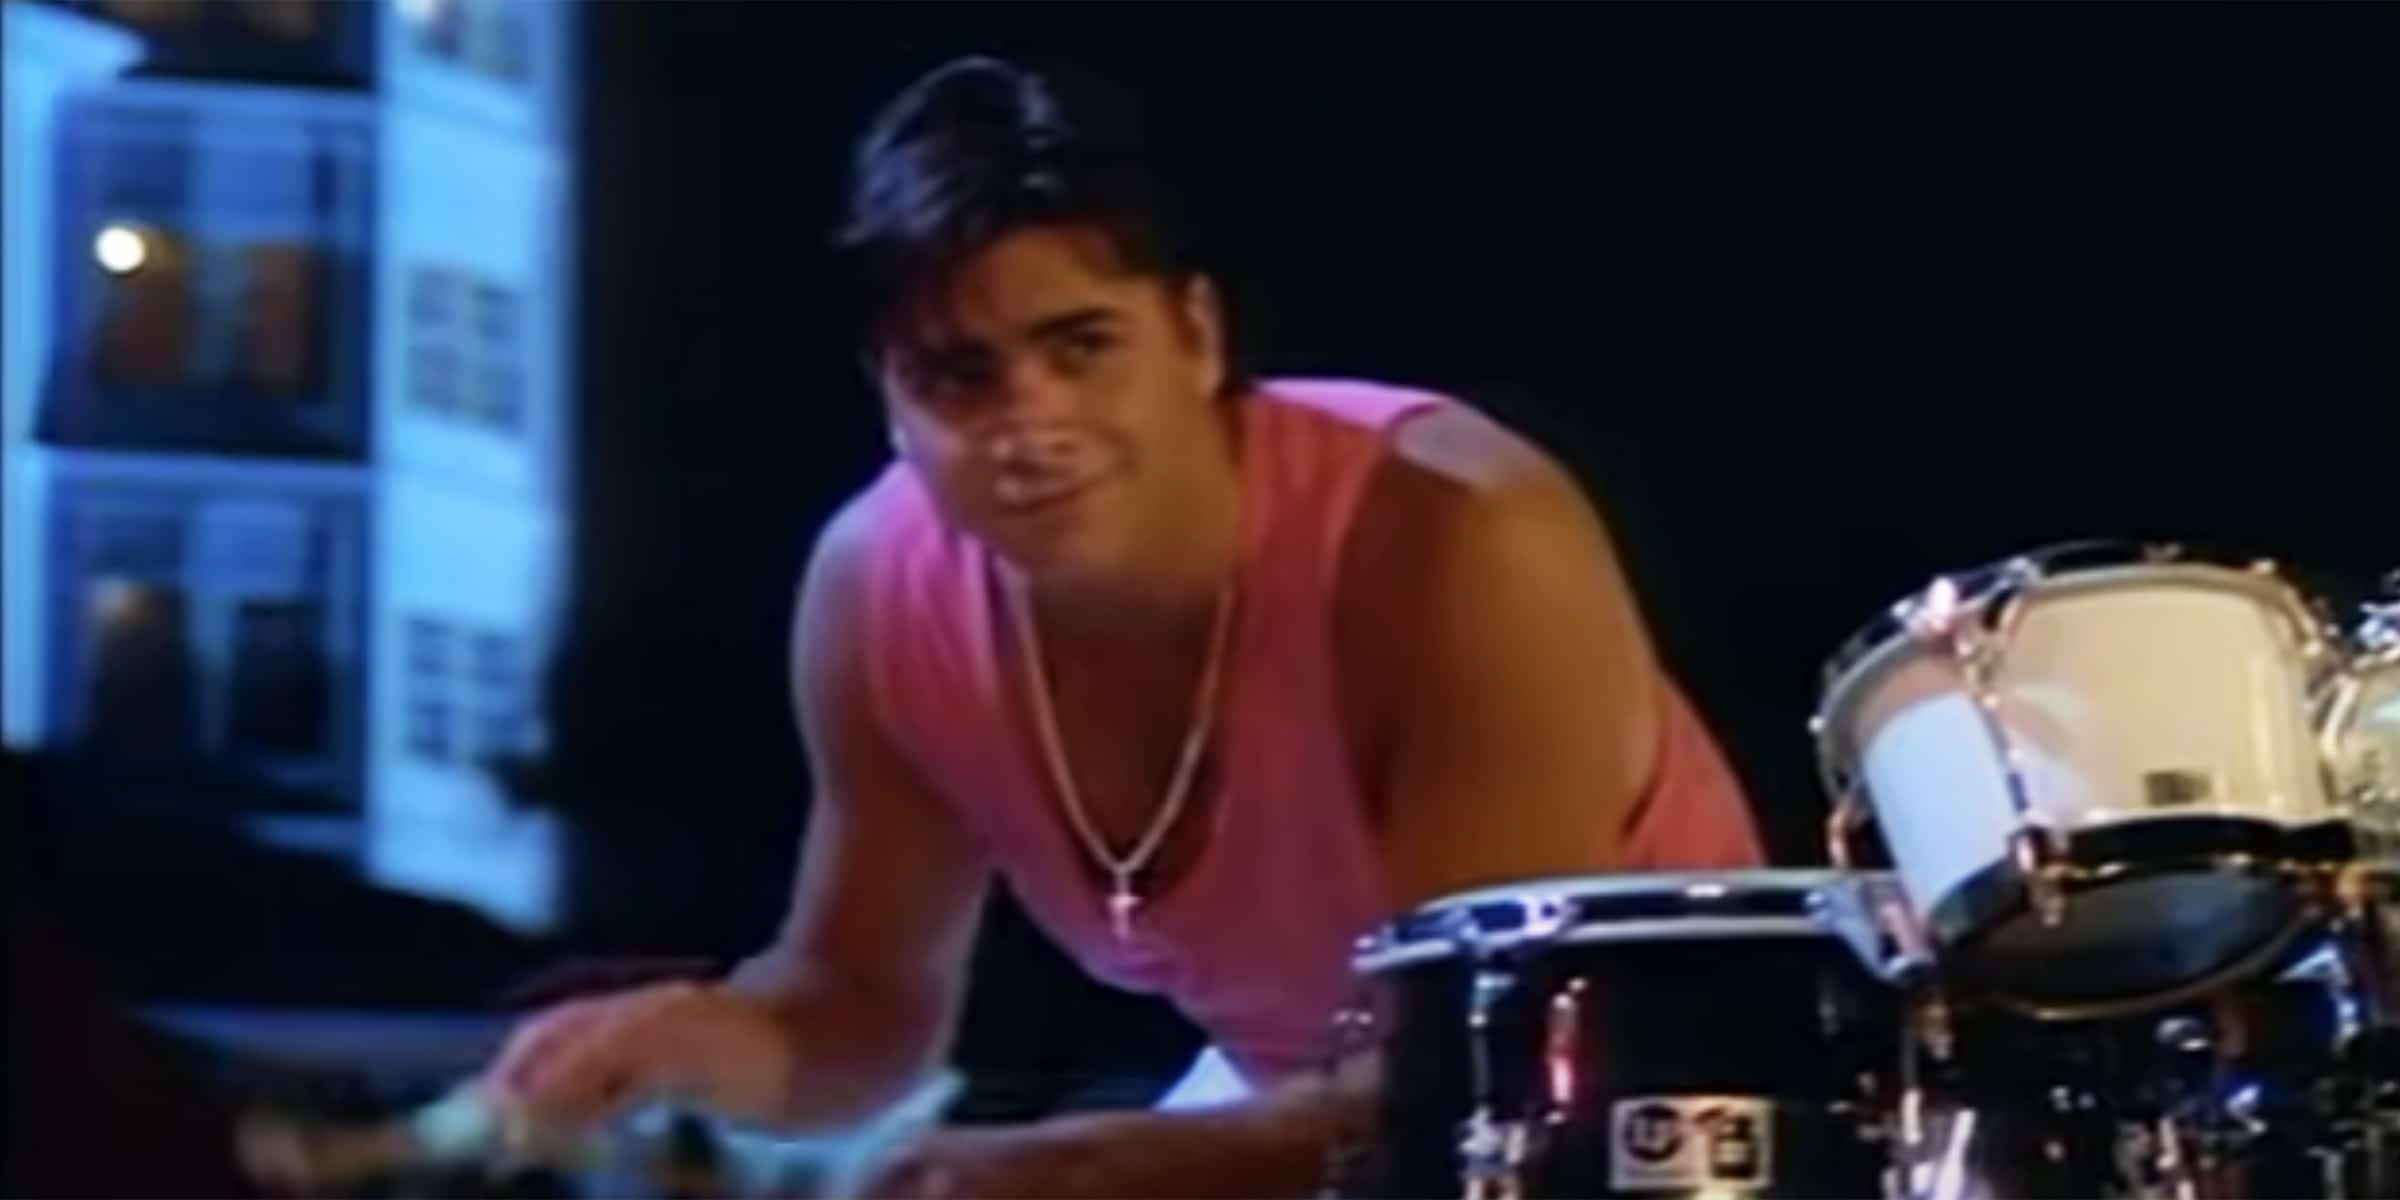 John Stamos in Beach Boys video kokomo